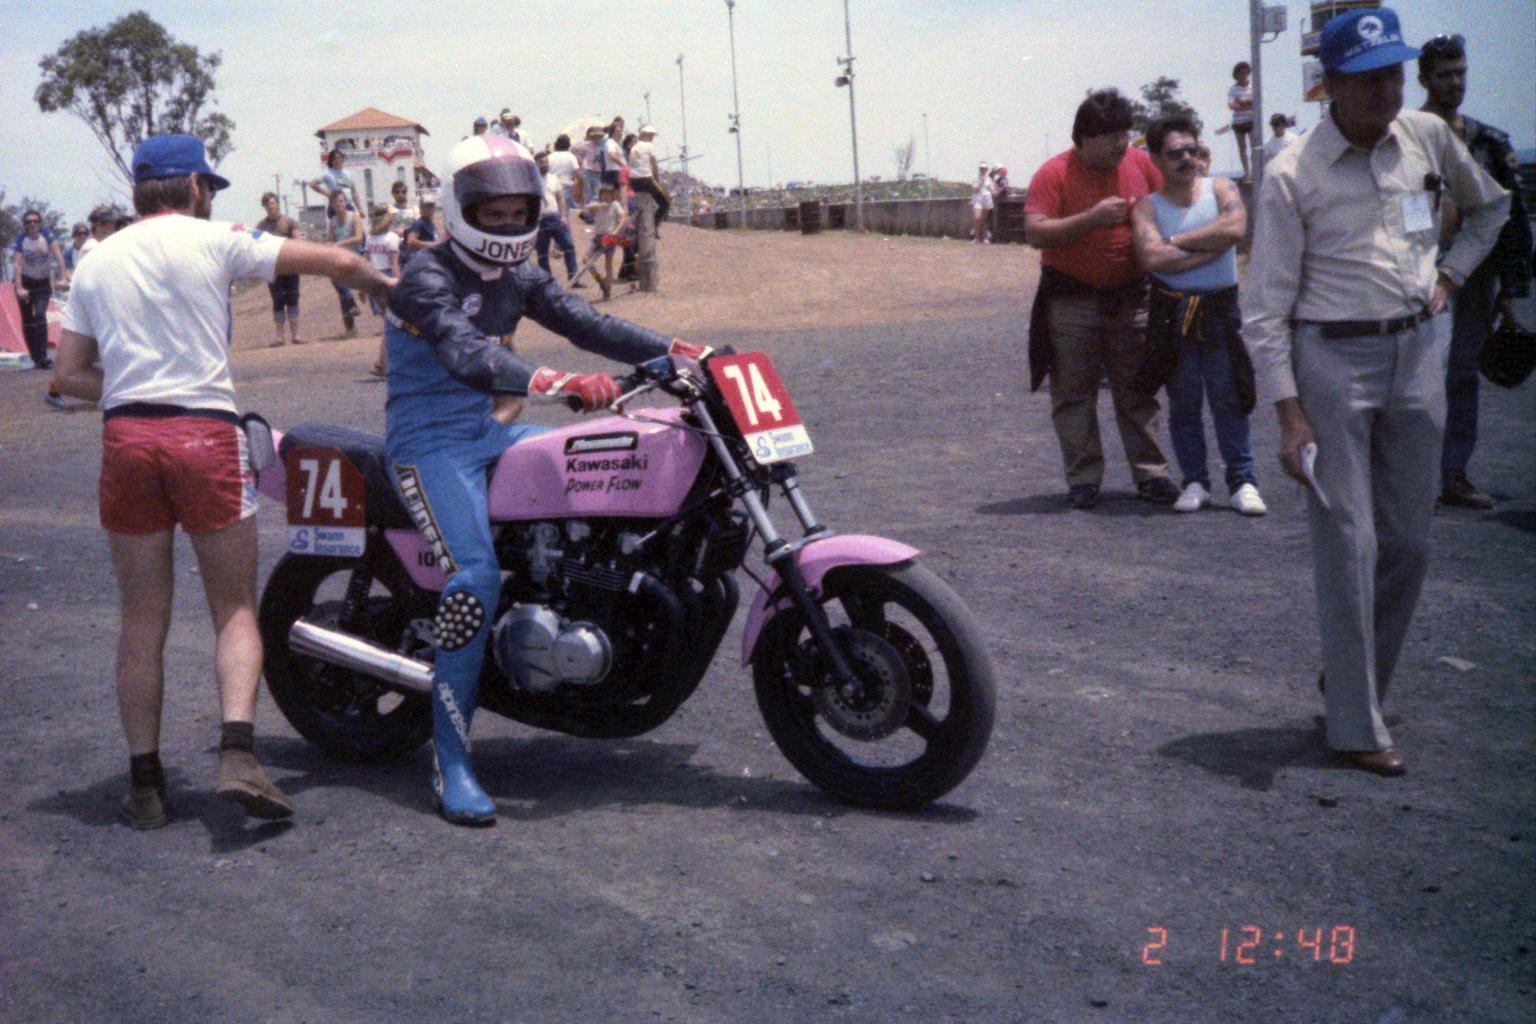 1984_Australia-12-2_サイモン・ジョーンズのKAWASAKI950cc